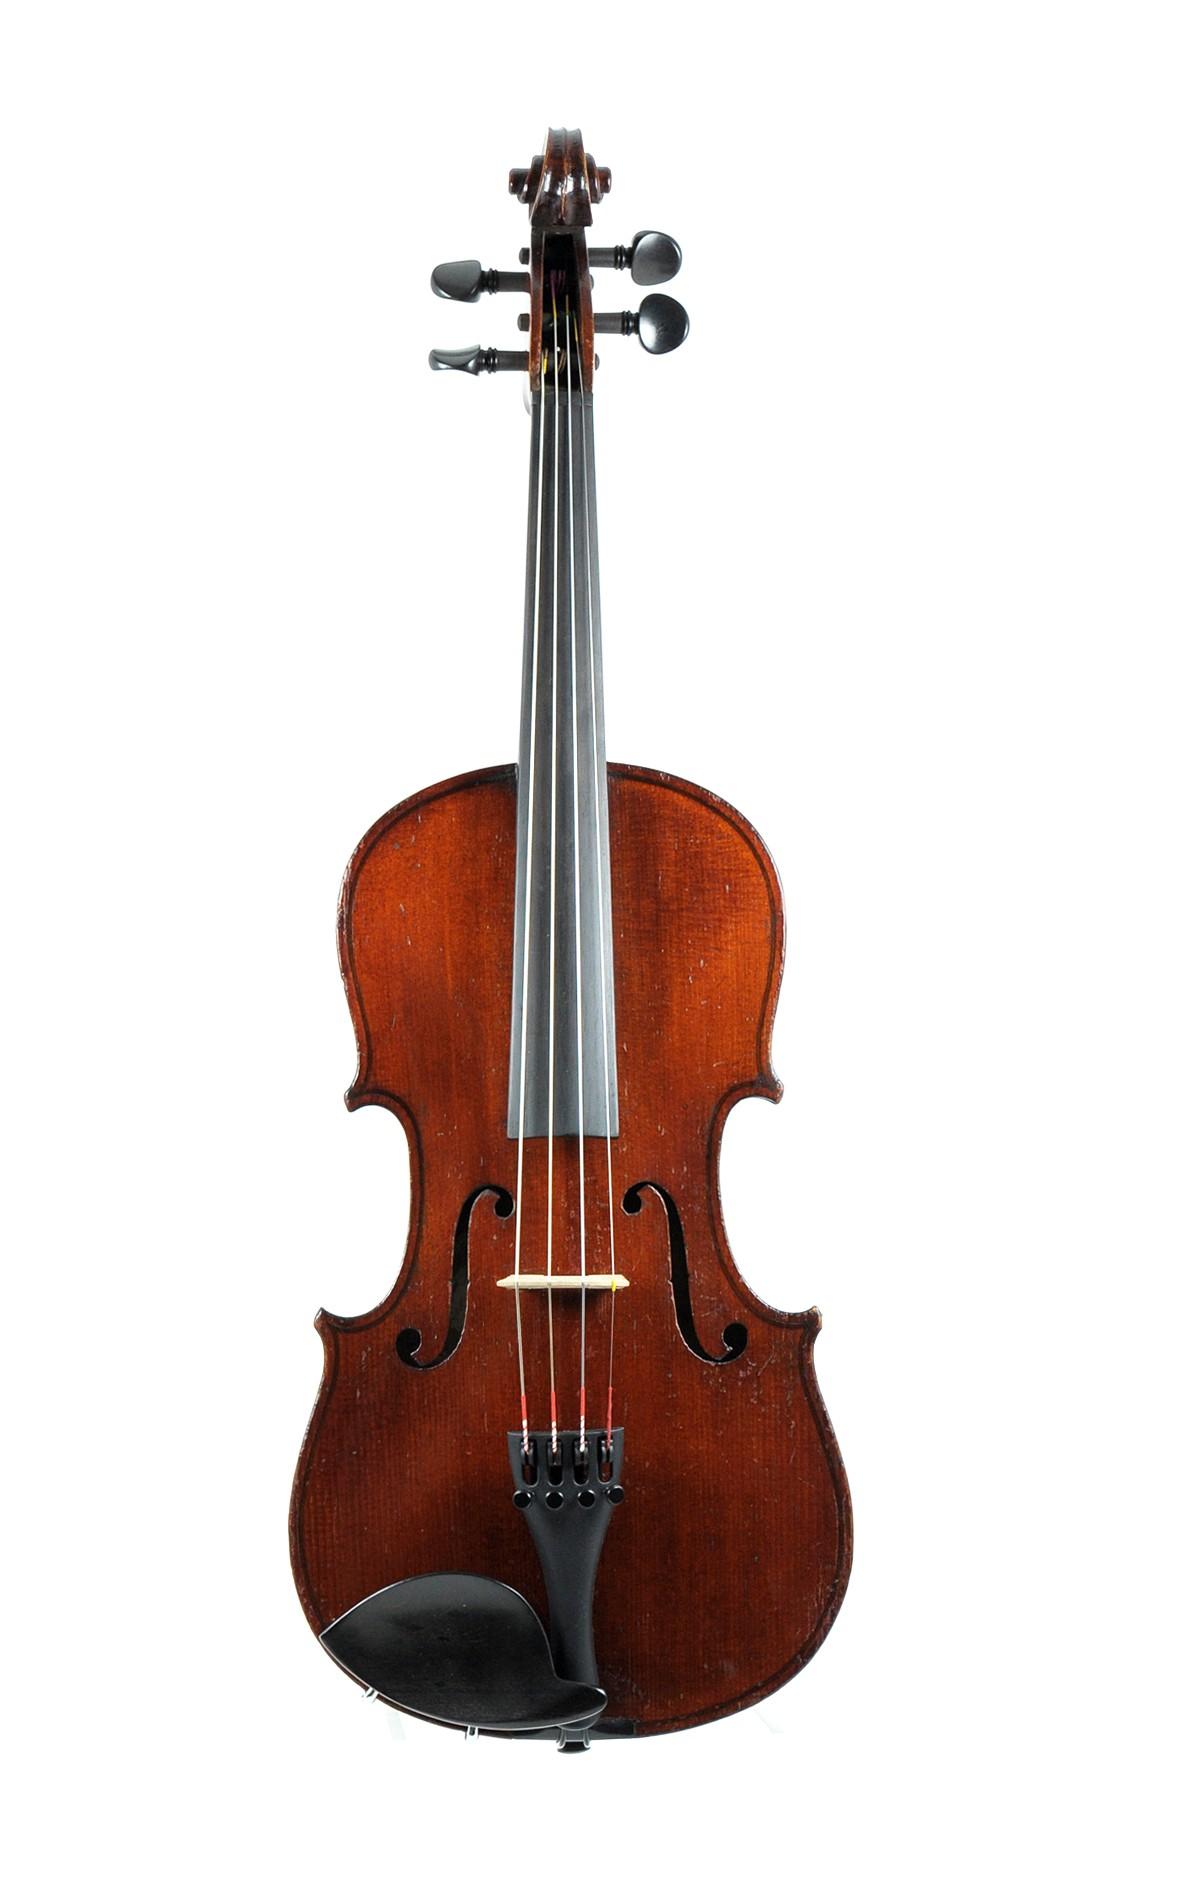 Maidstone violin, Murdoch & Co. London approx. 1900 - top